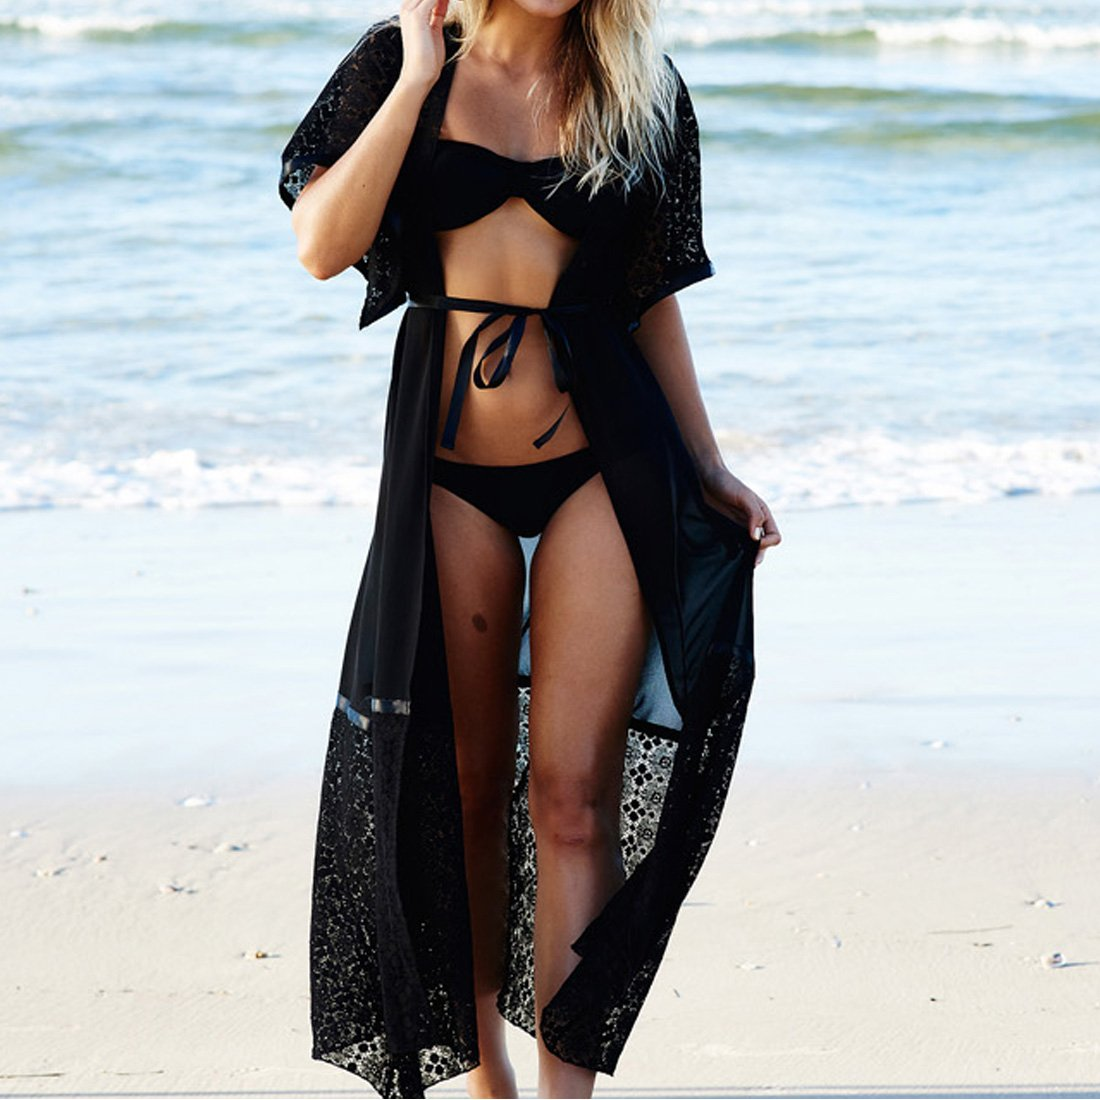 DorkasDE Damen Strandkleidung Schwarz Kaftan Spitzenj/äckchen Klimaanlage Kittel Bikini Vertuschung Beach Cover Umhang